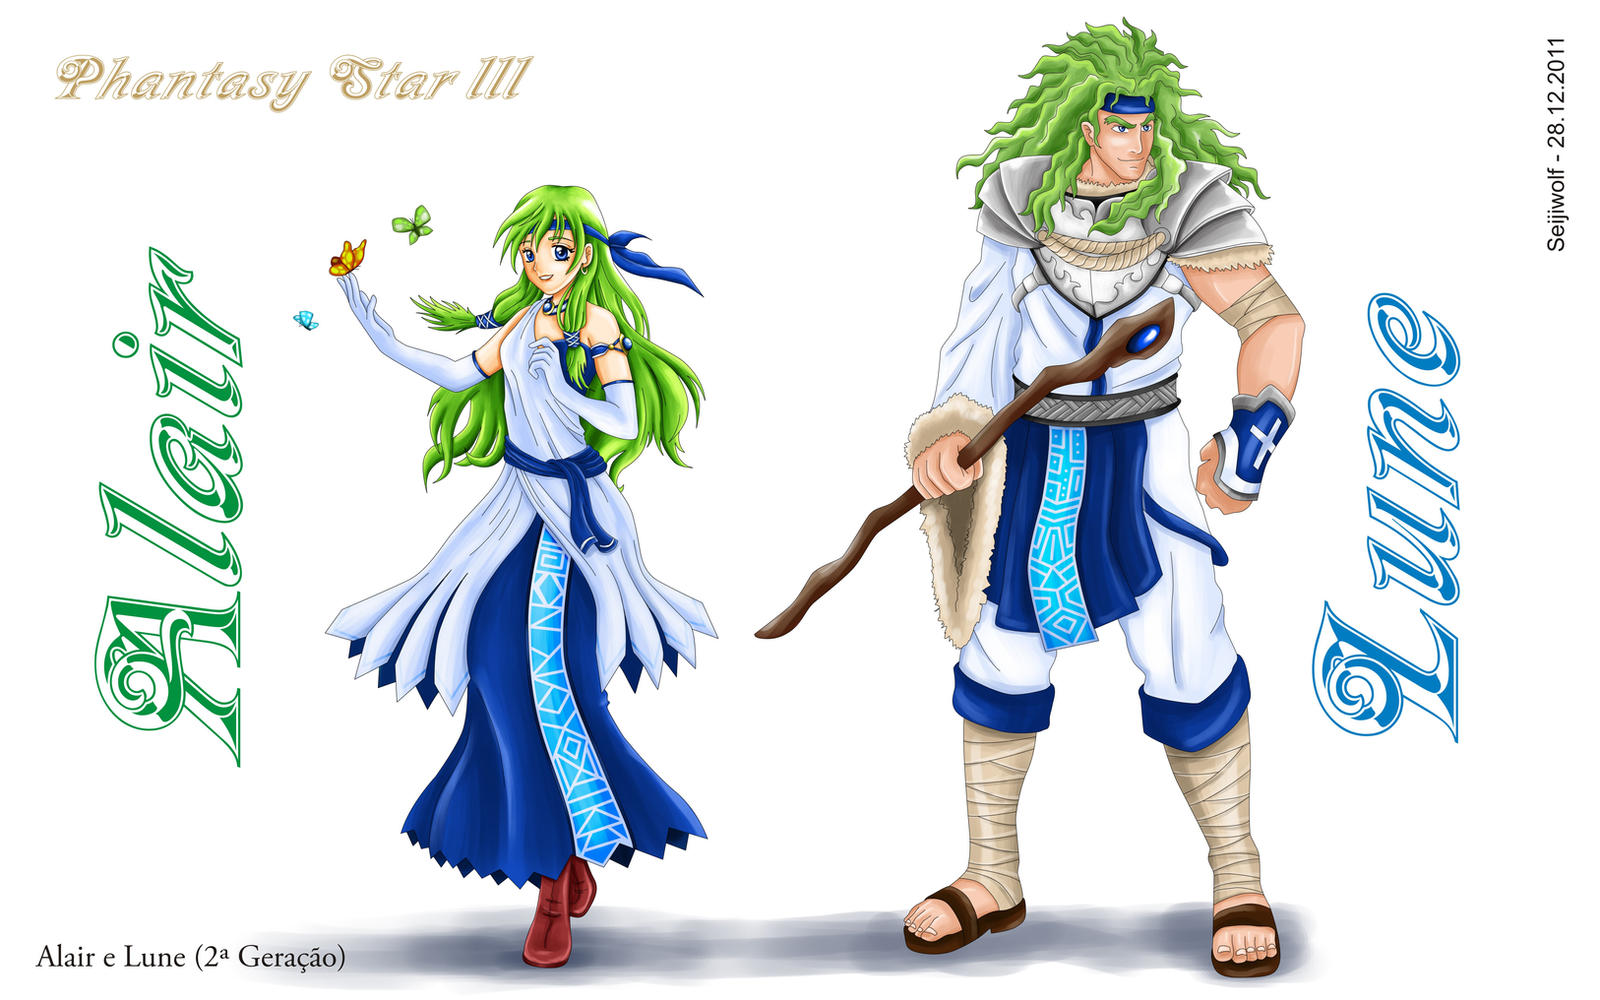 Alair e Lune - Phantasy Star 3 by seijiwolf